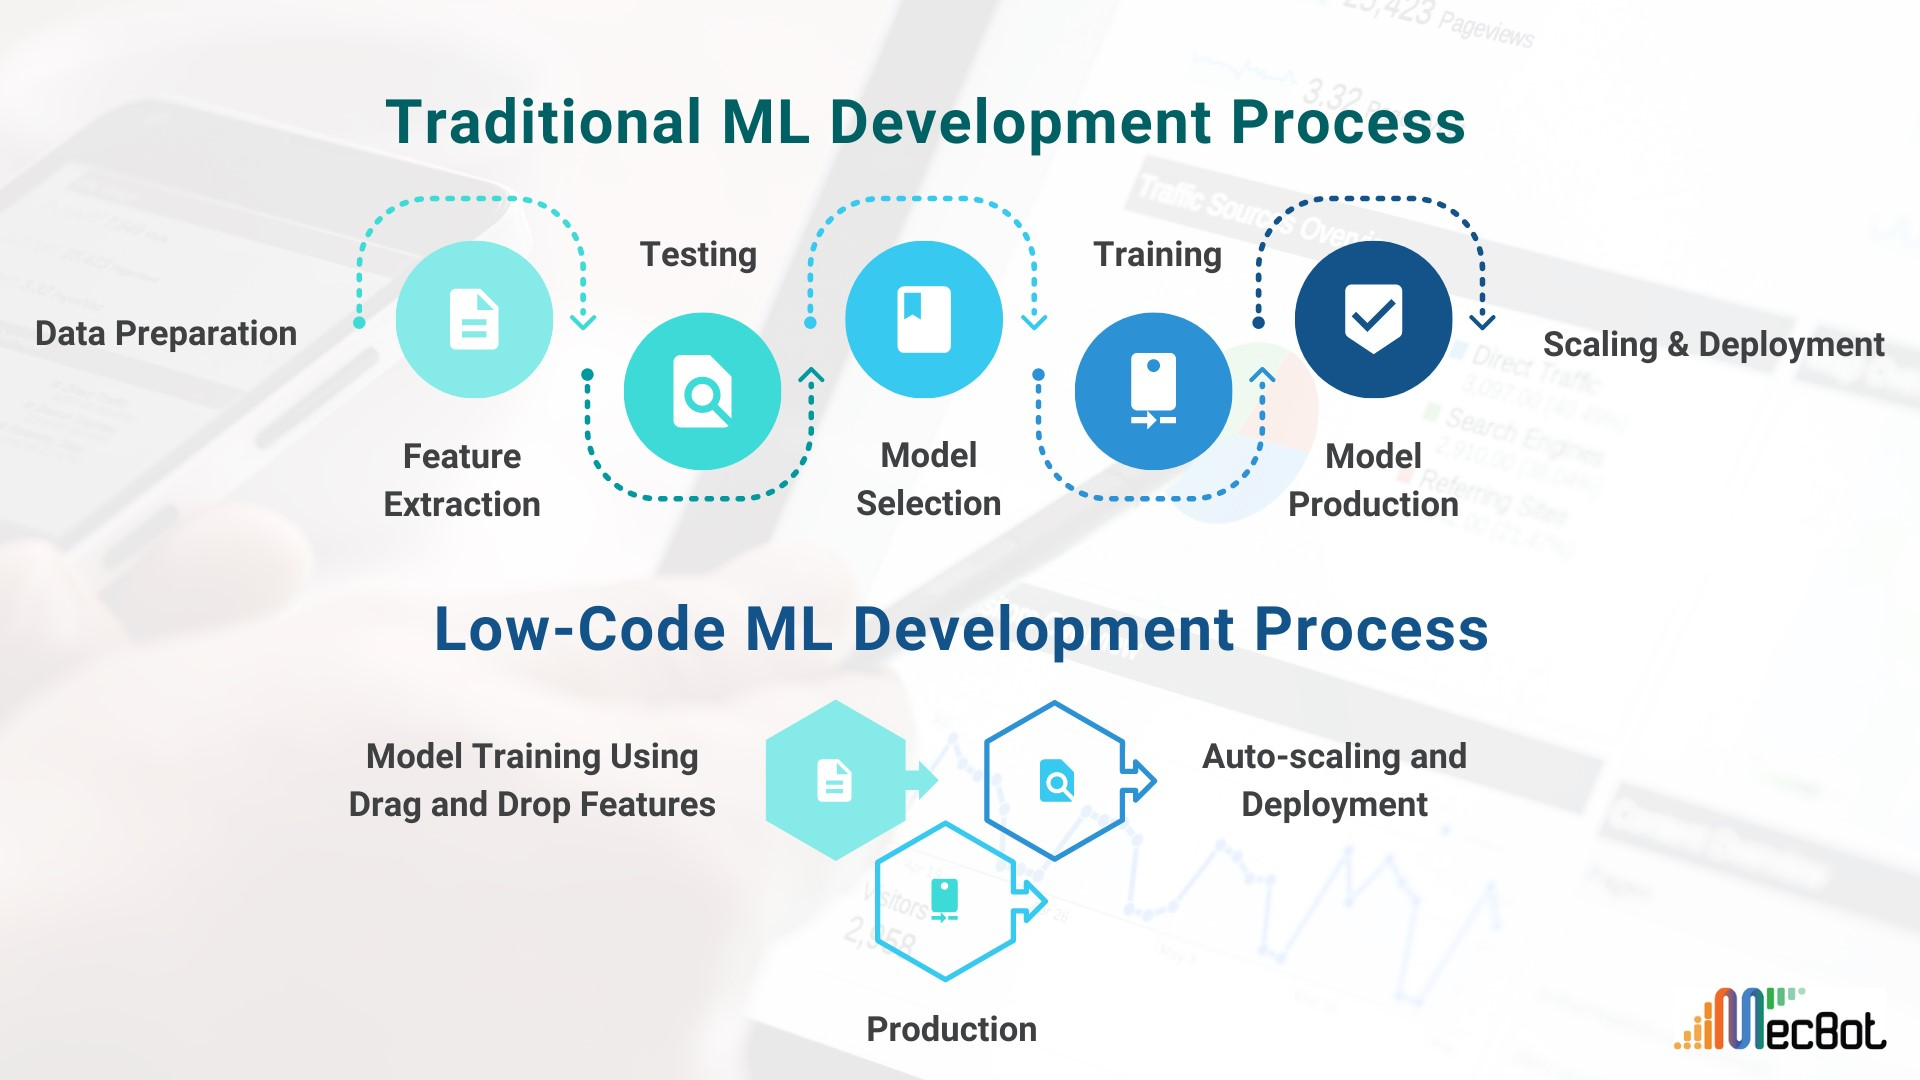 Traditional Vs Low-Code ML Development